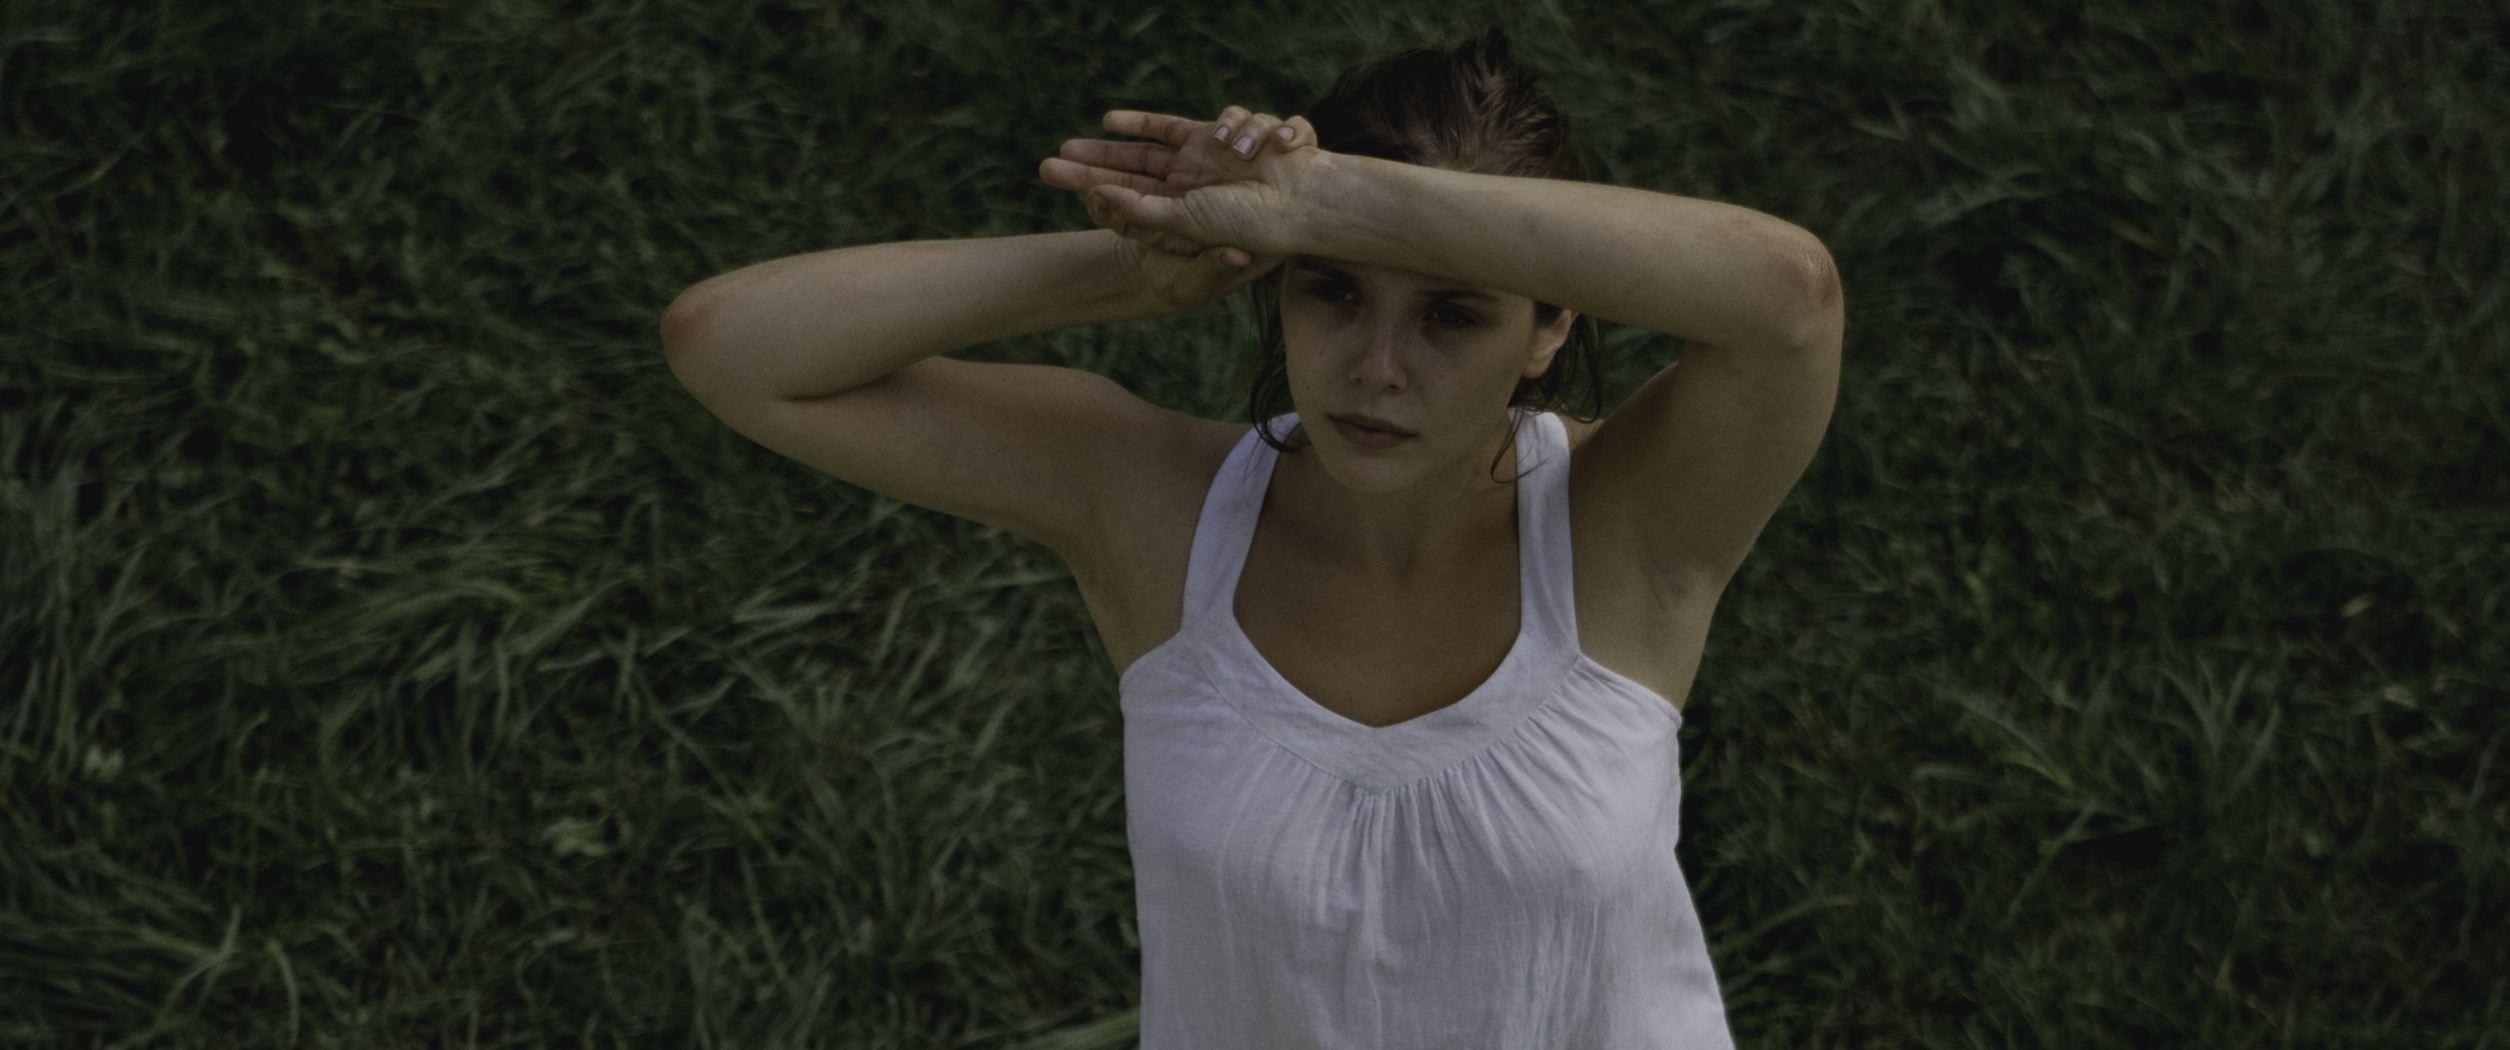 кадры из фильма Марта Марси Мэй Марлен Элизабет Олсен,